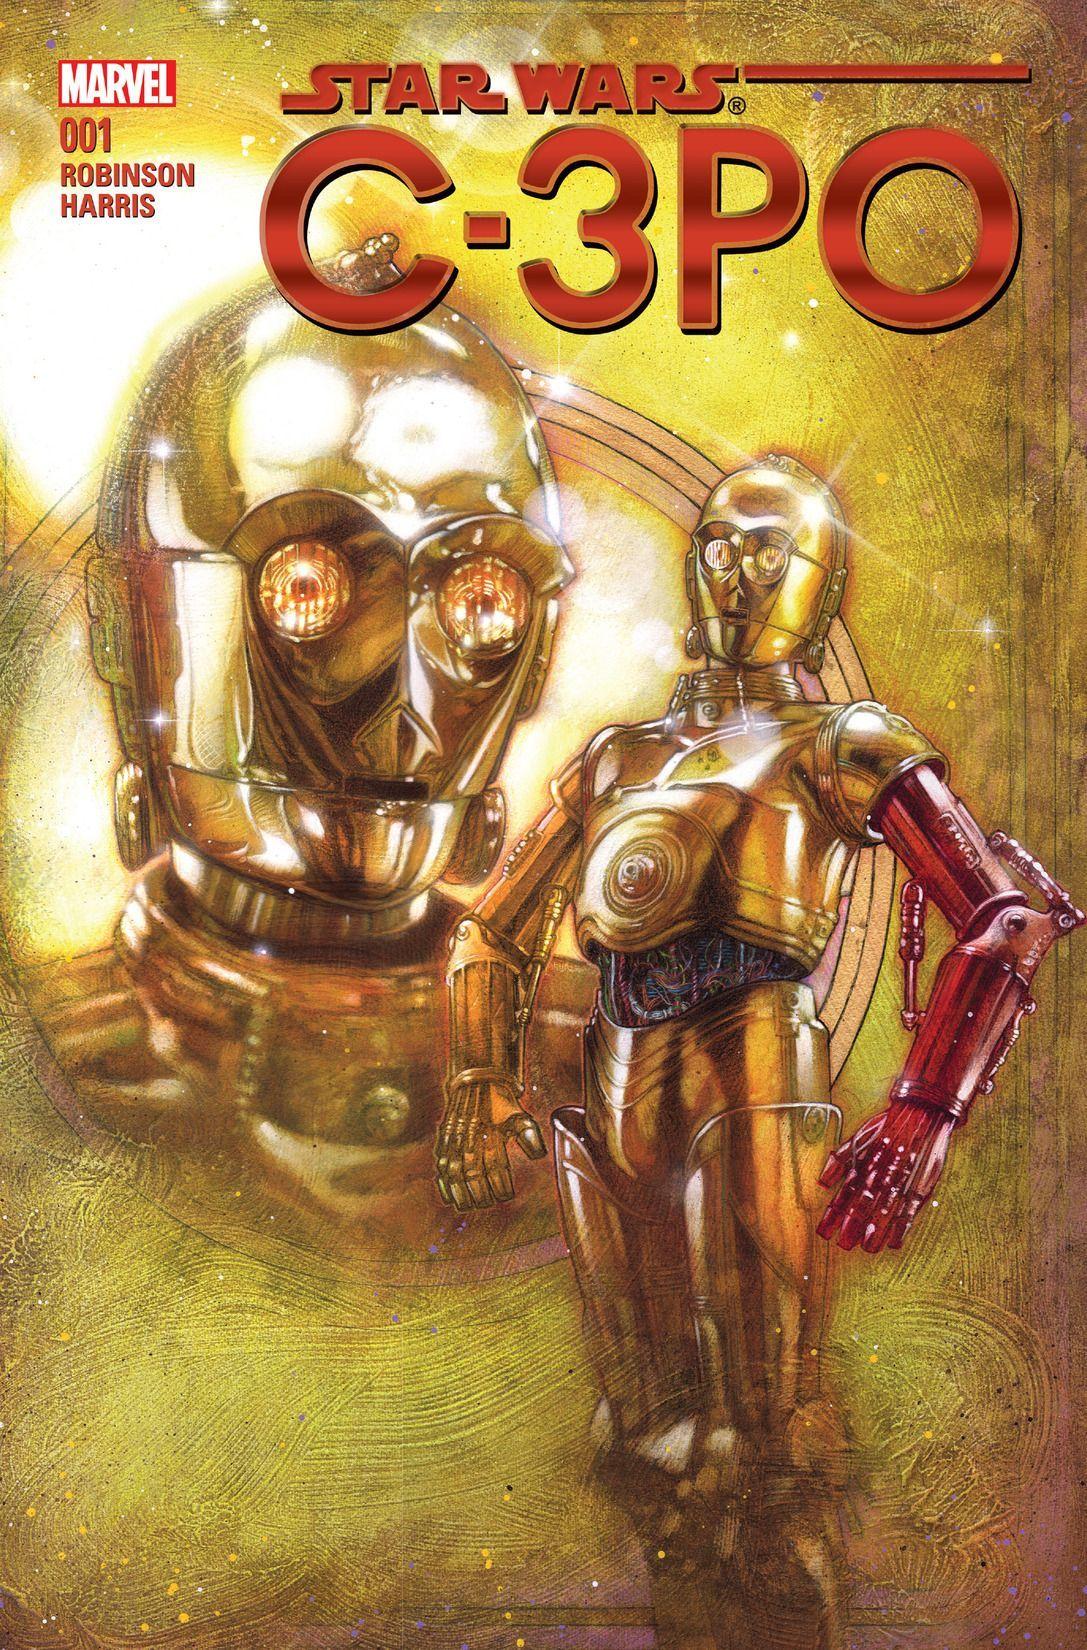 Star Wars: C-3PO - The Phantom Limb #1